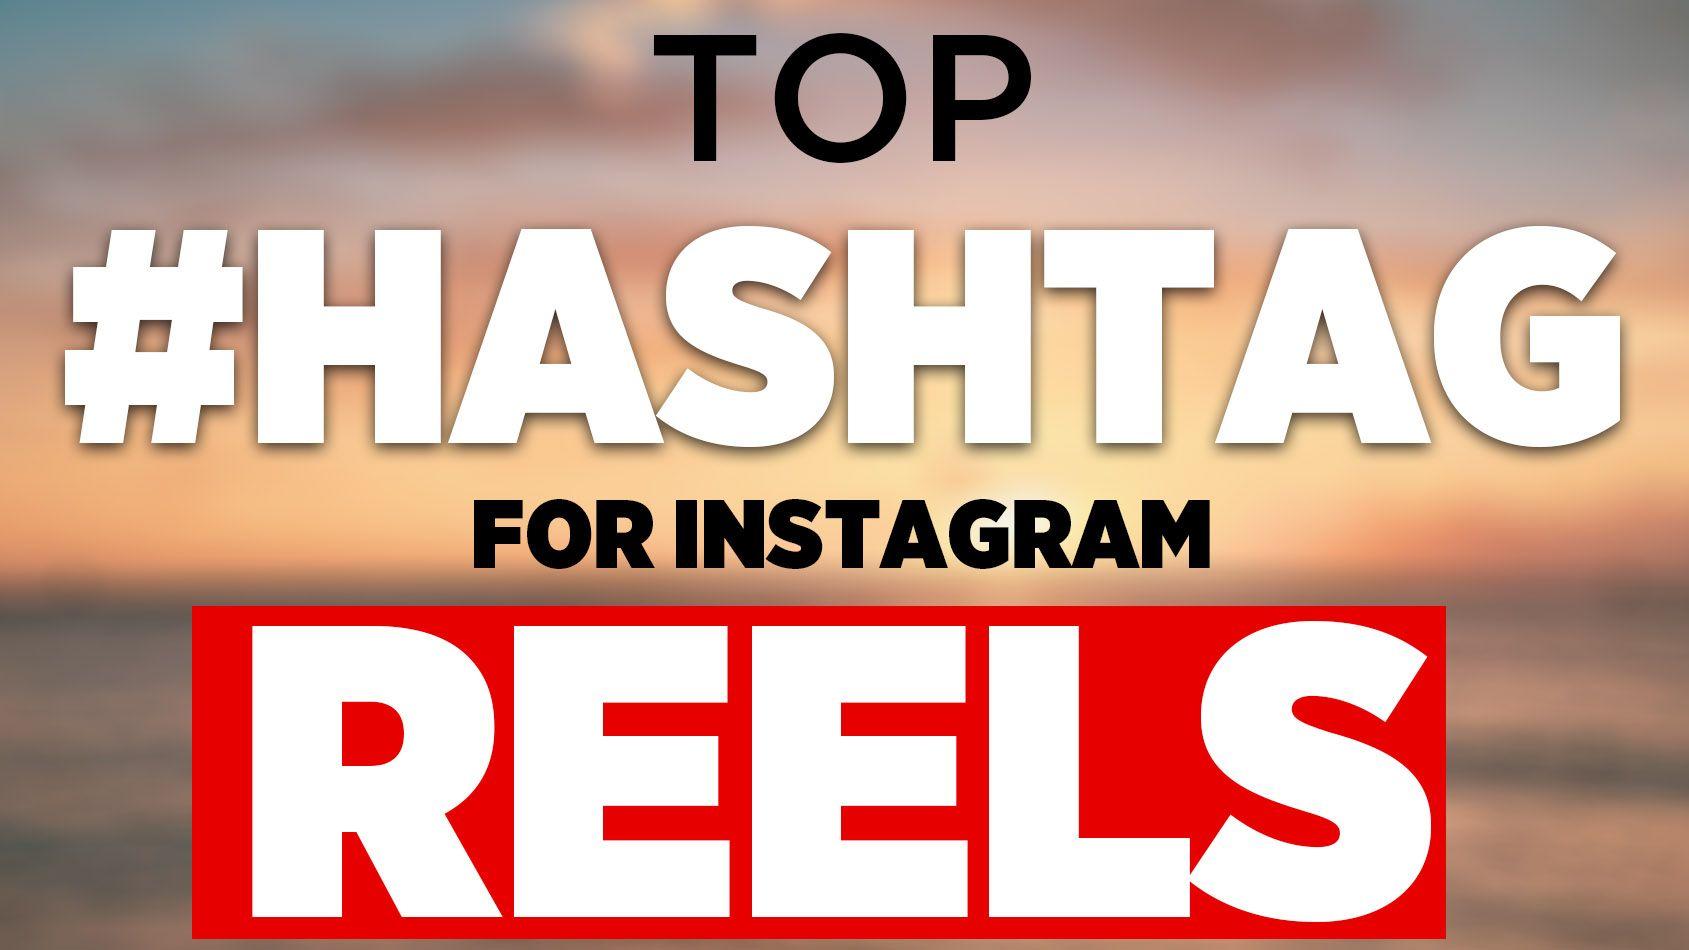 Best Hashtags For Reels On Instagram 2020 In 2021 Hashtag Instagram Instagram Instagram Hashtags